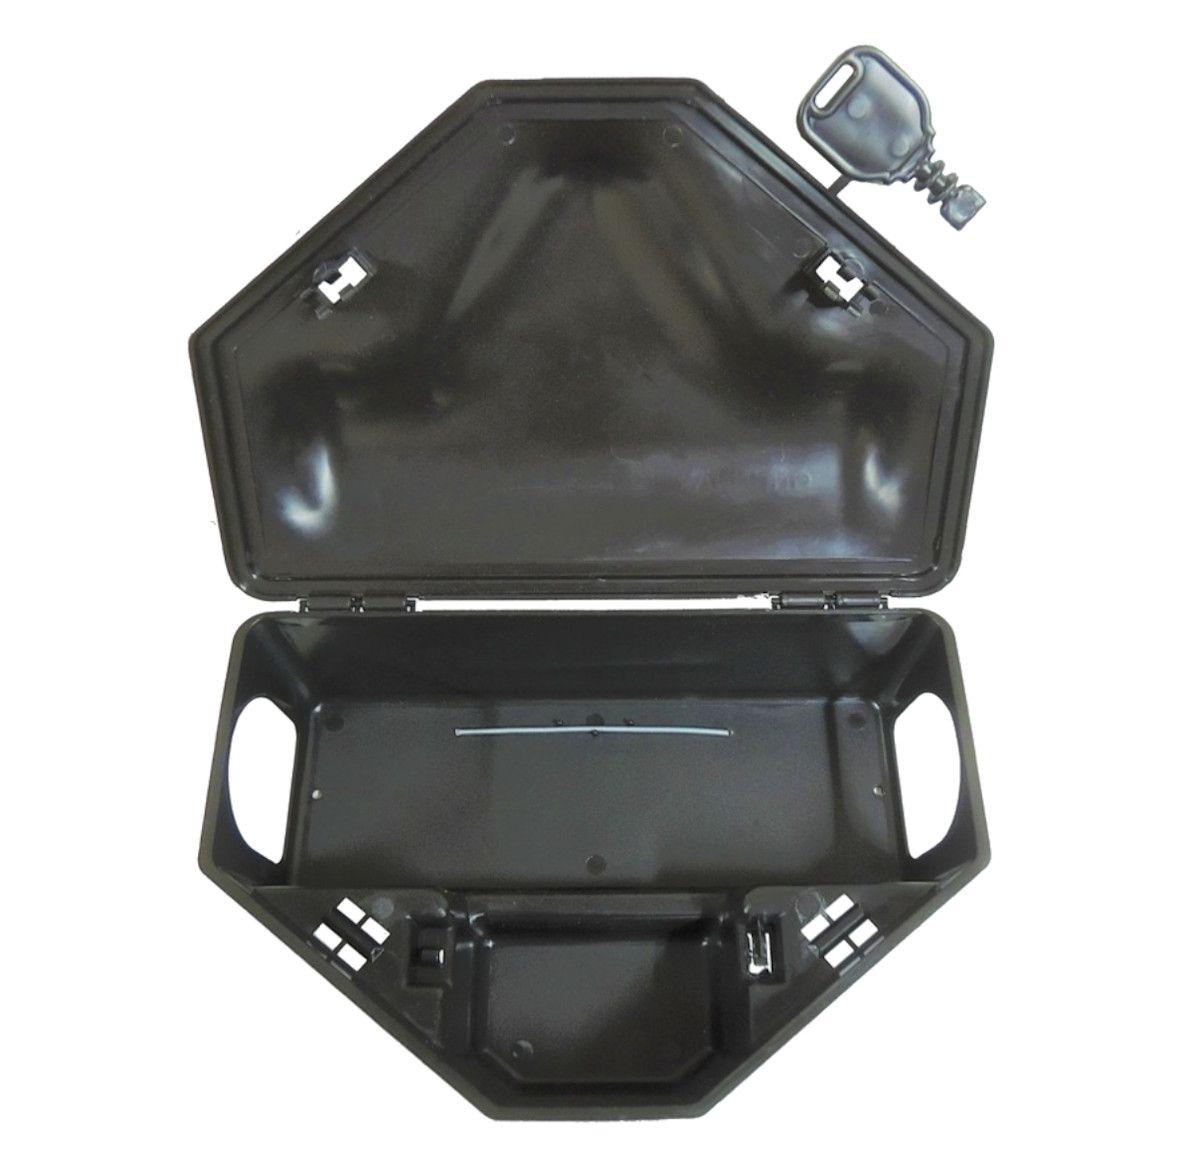 Kit 56 Porta Isca Com 2 Chaves - Duplo Travamento